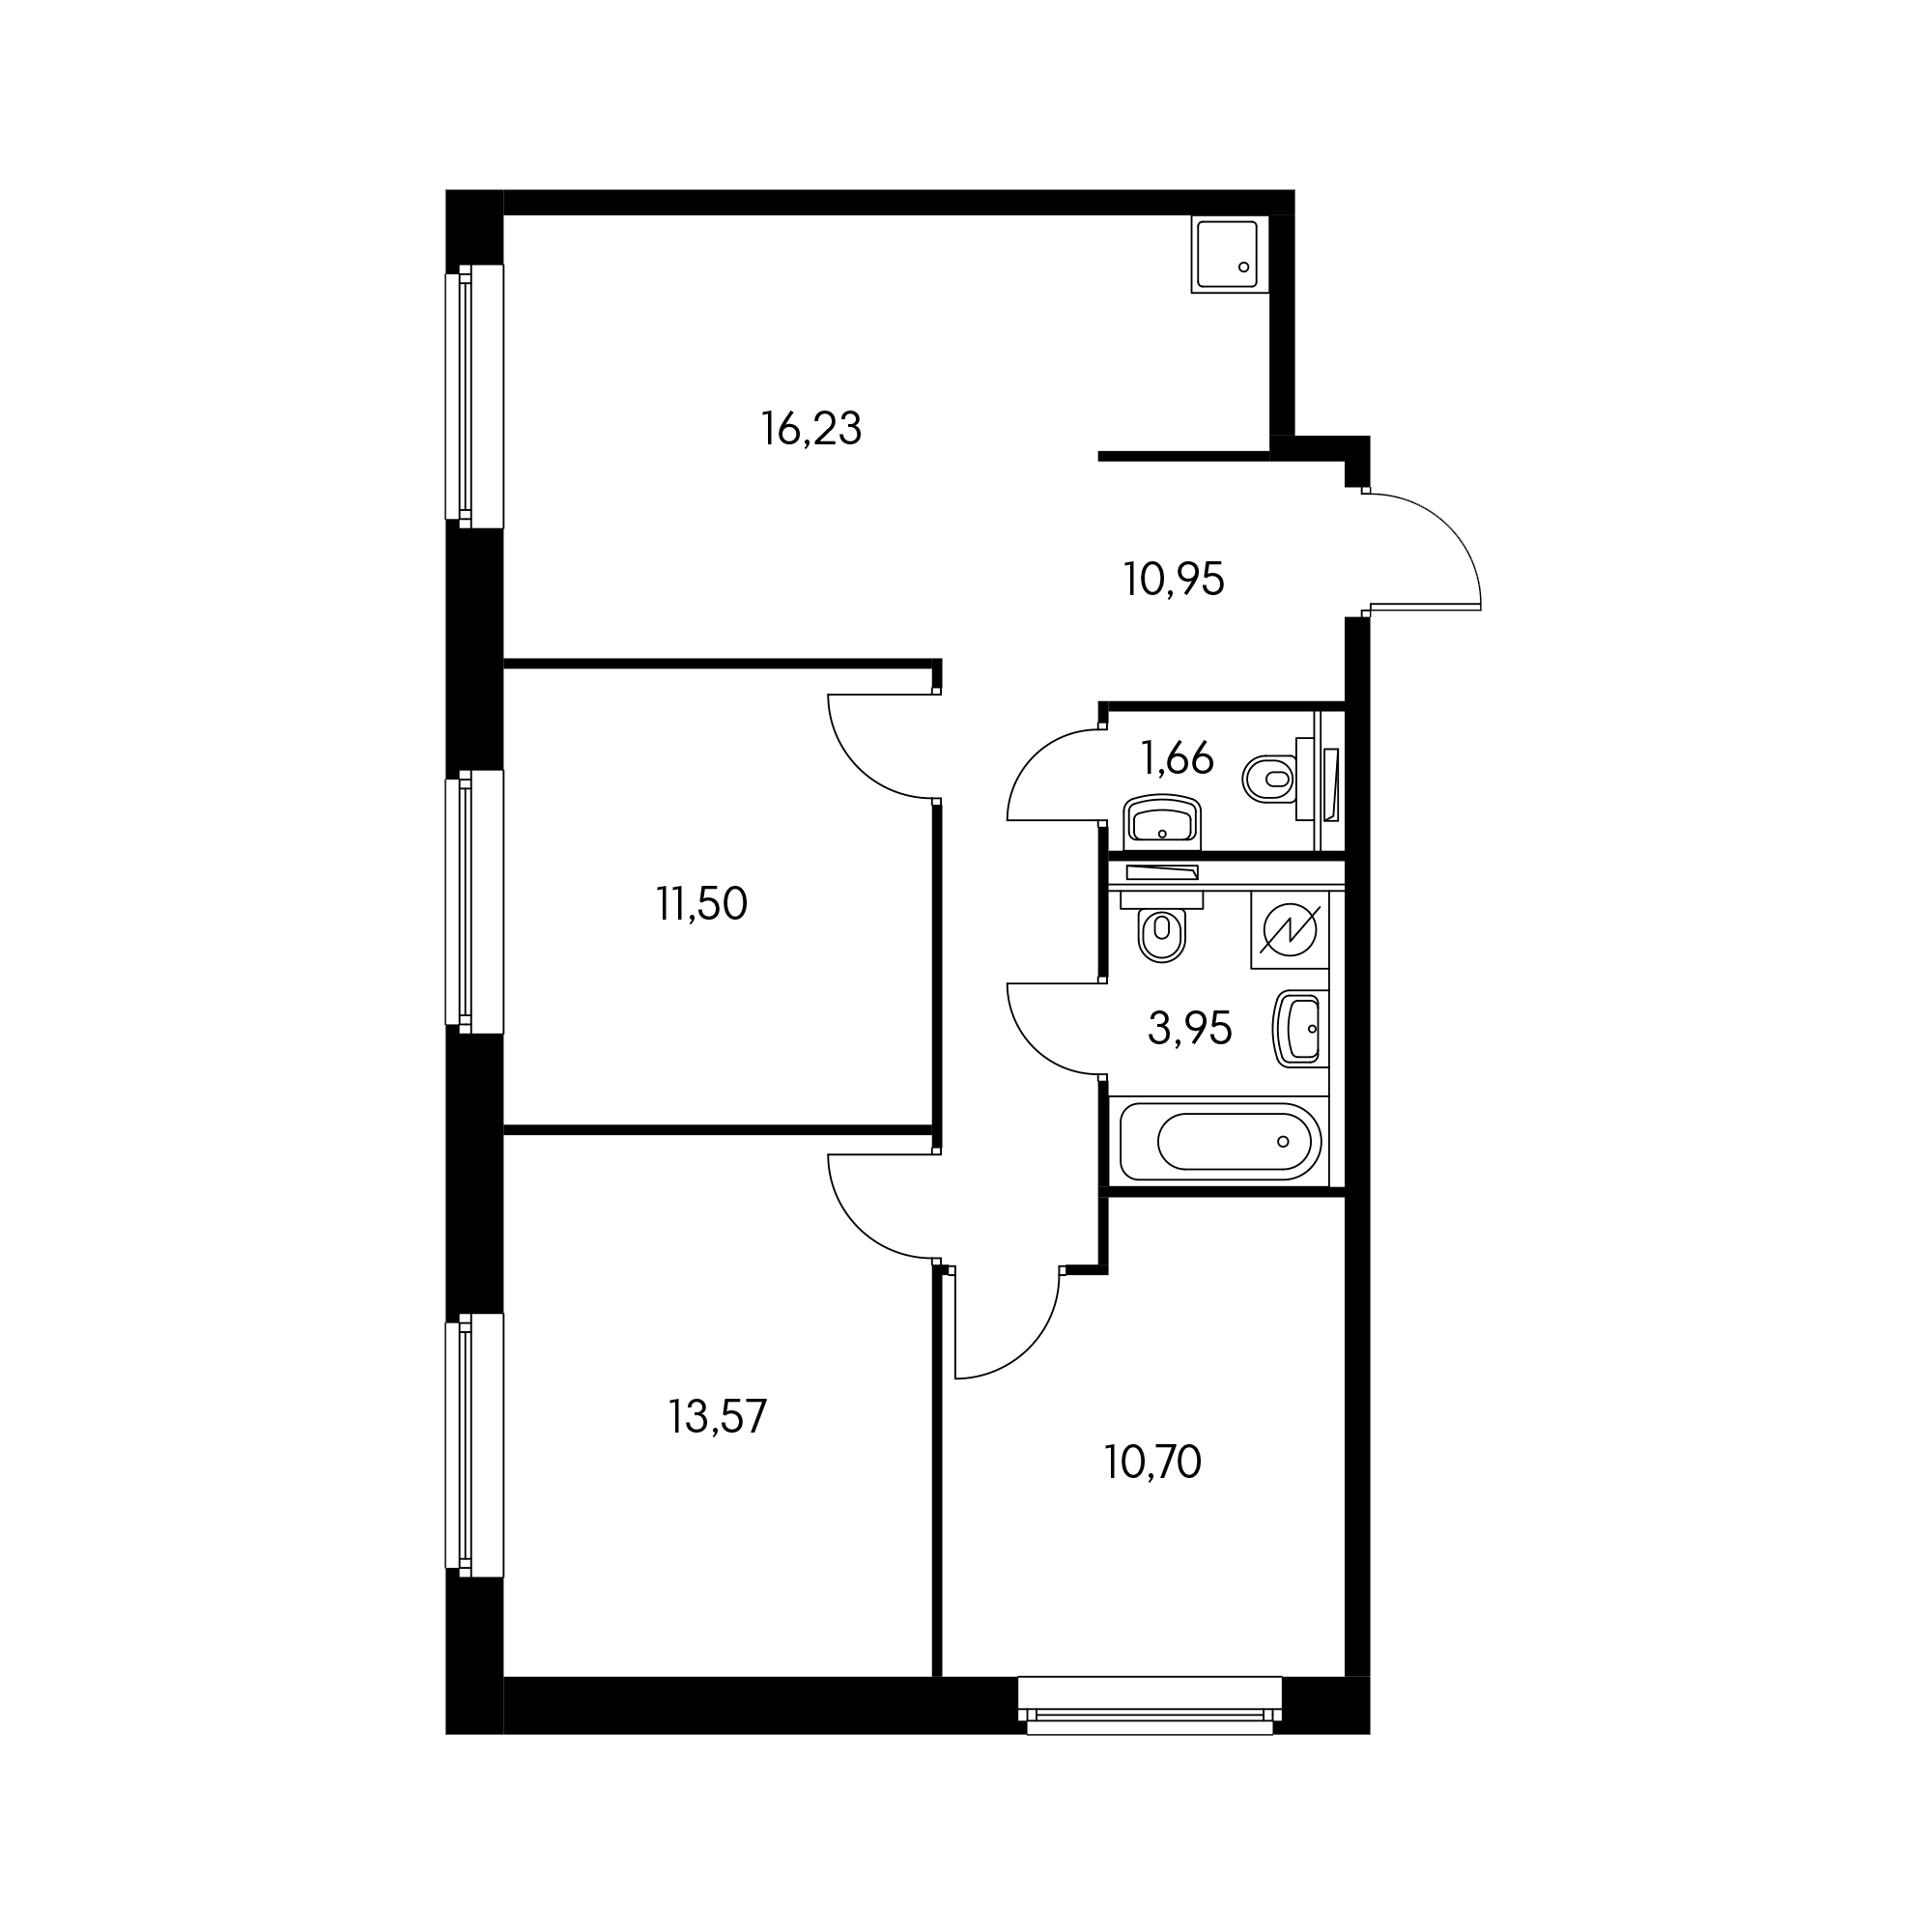 3KM13_6.9-1